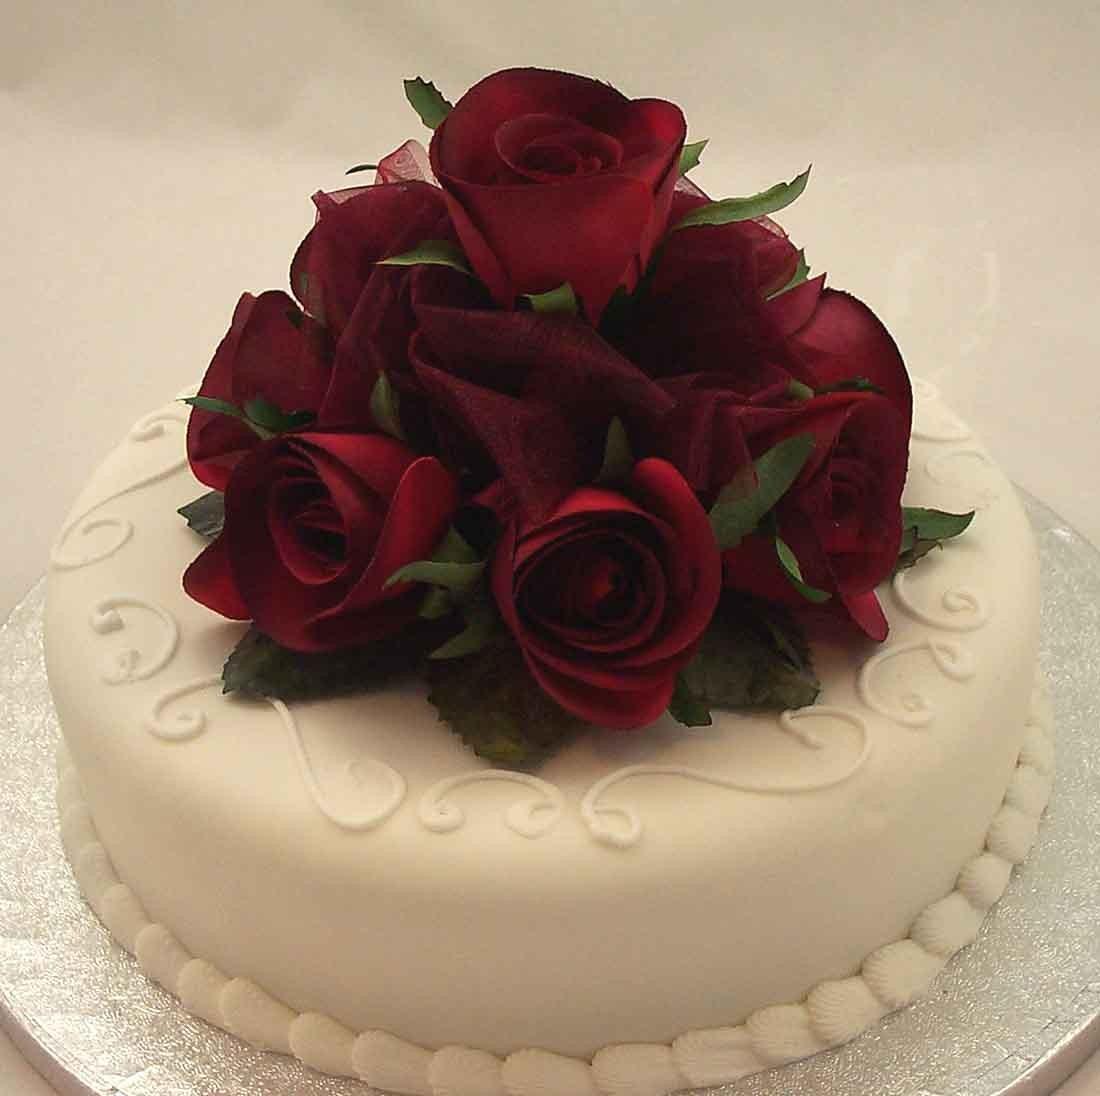 Cake Decorations Burgundy Rose Organza Cake Topper Silk Wedding